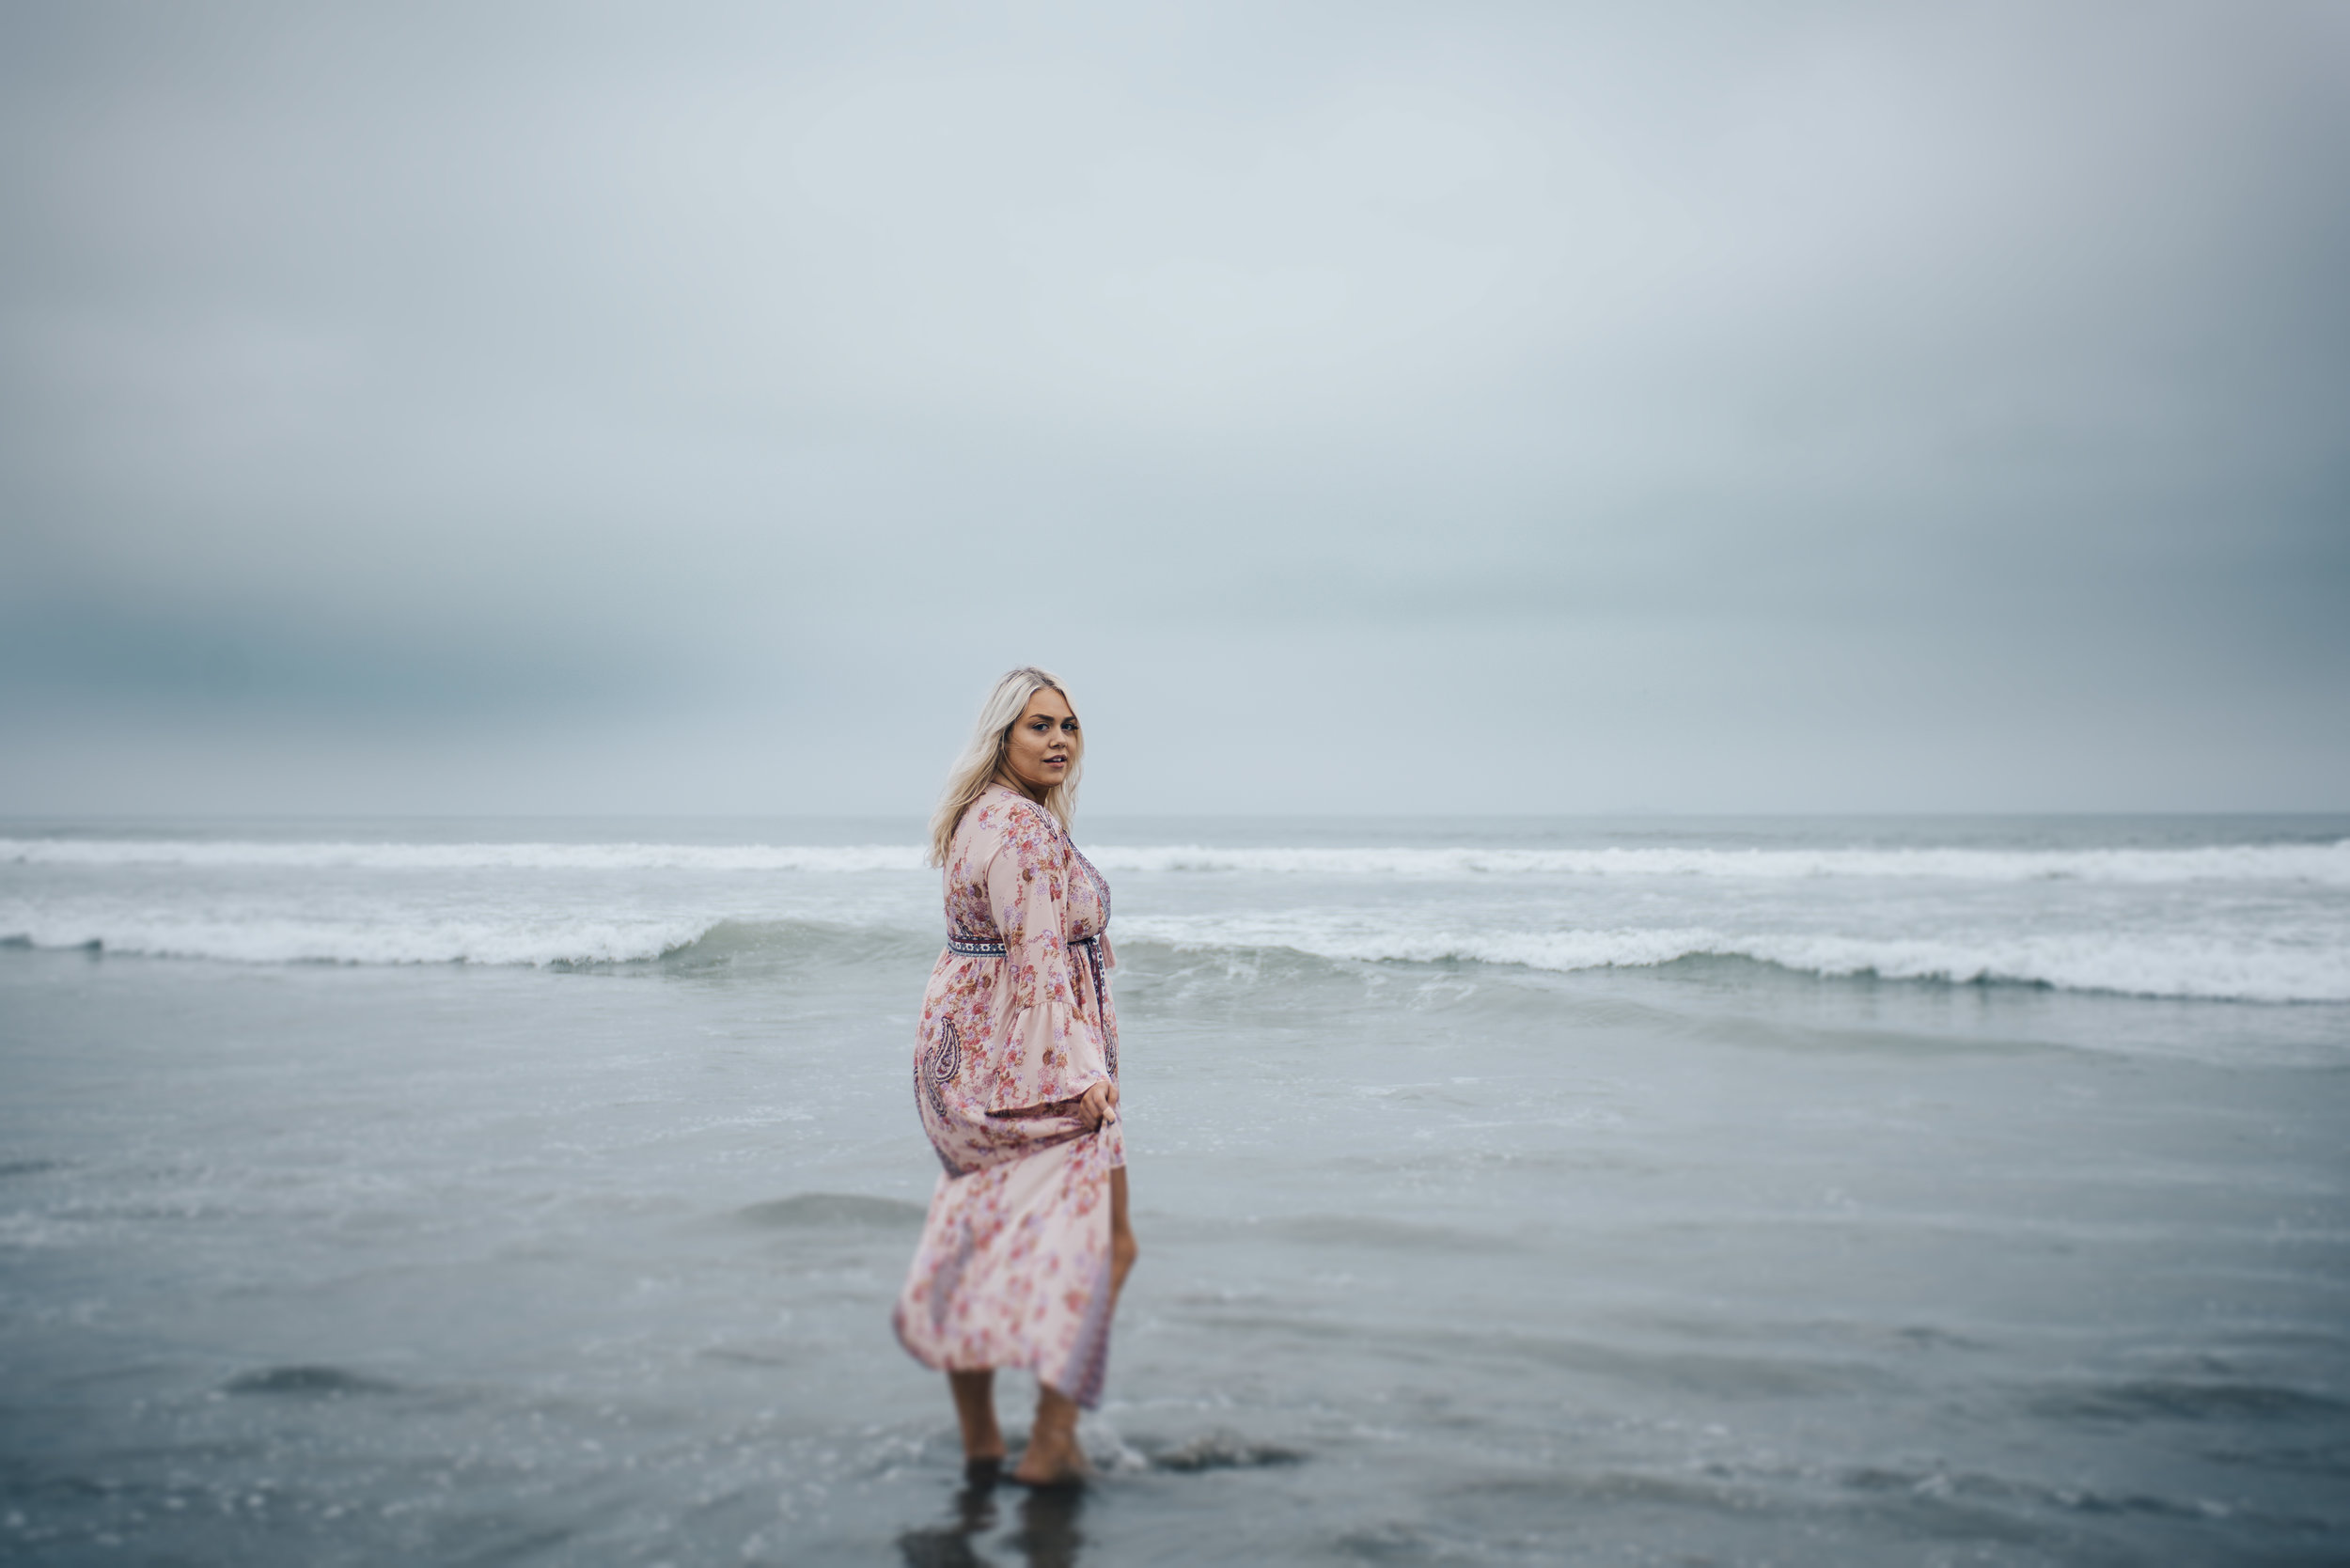 coronado photographer, lifestyle photographer, san diego photographer, san diego beaches, beach, waves, sea, ocean, woman, blonde, portrait, cali girl, southern california,